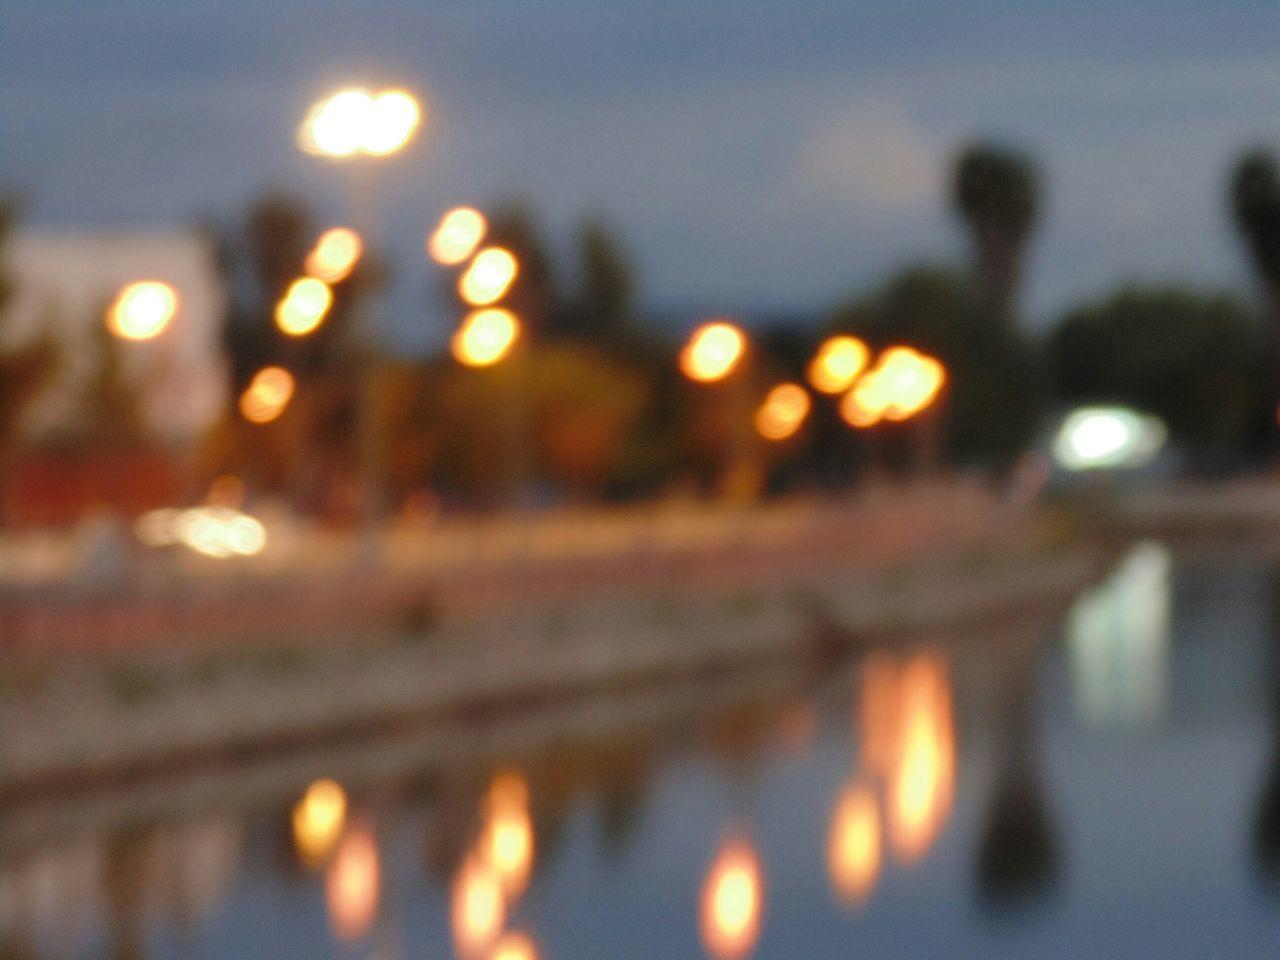 Glitch EyeEm Best Shots - No Edit Moita EyeEm Glitch Art Moita Taking Photos EyeEm EyeEm Gallery Night Lights Cities At Night